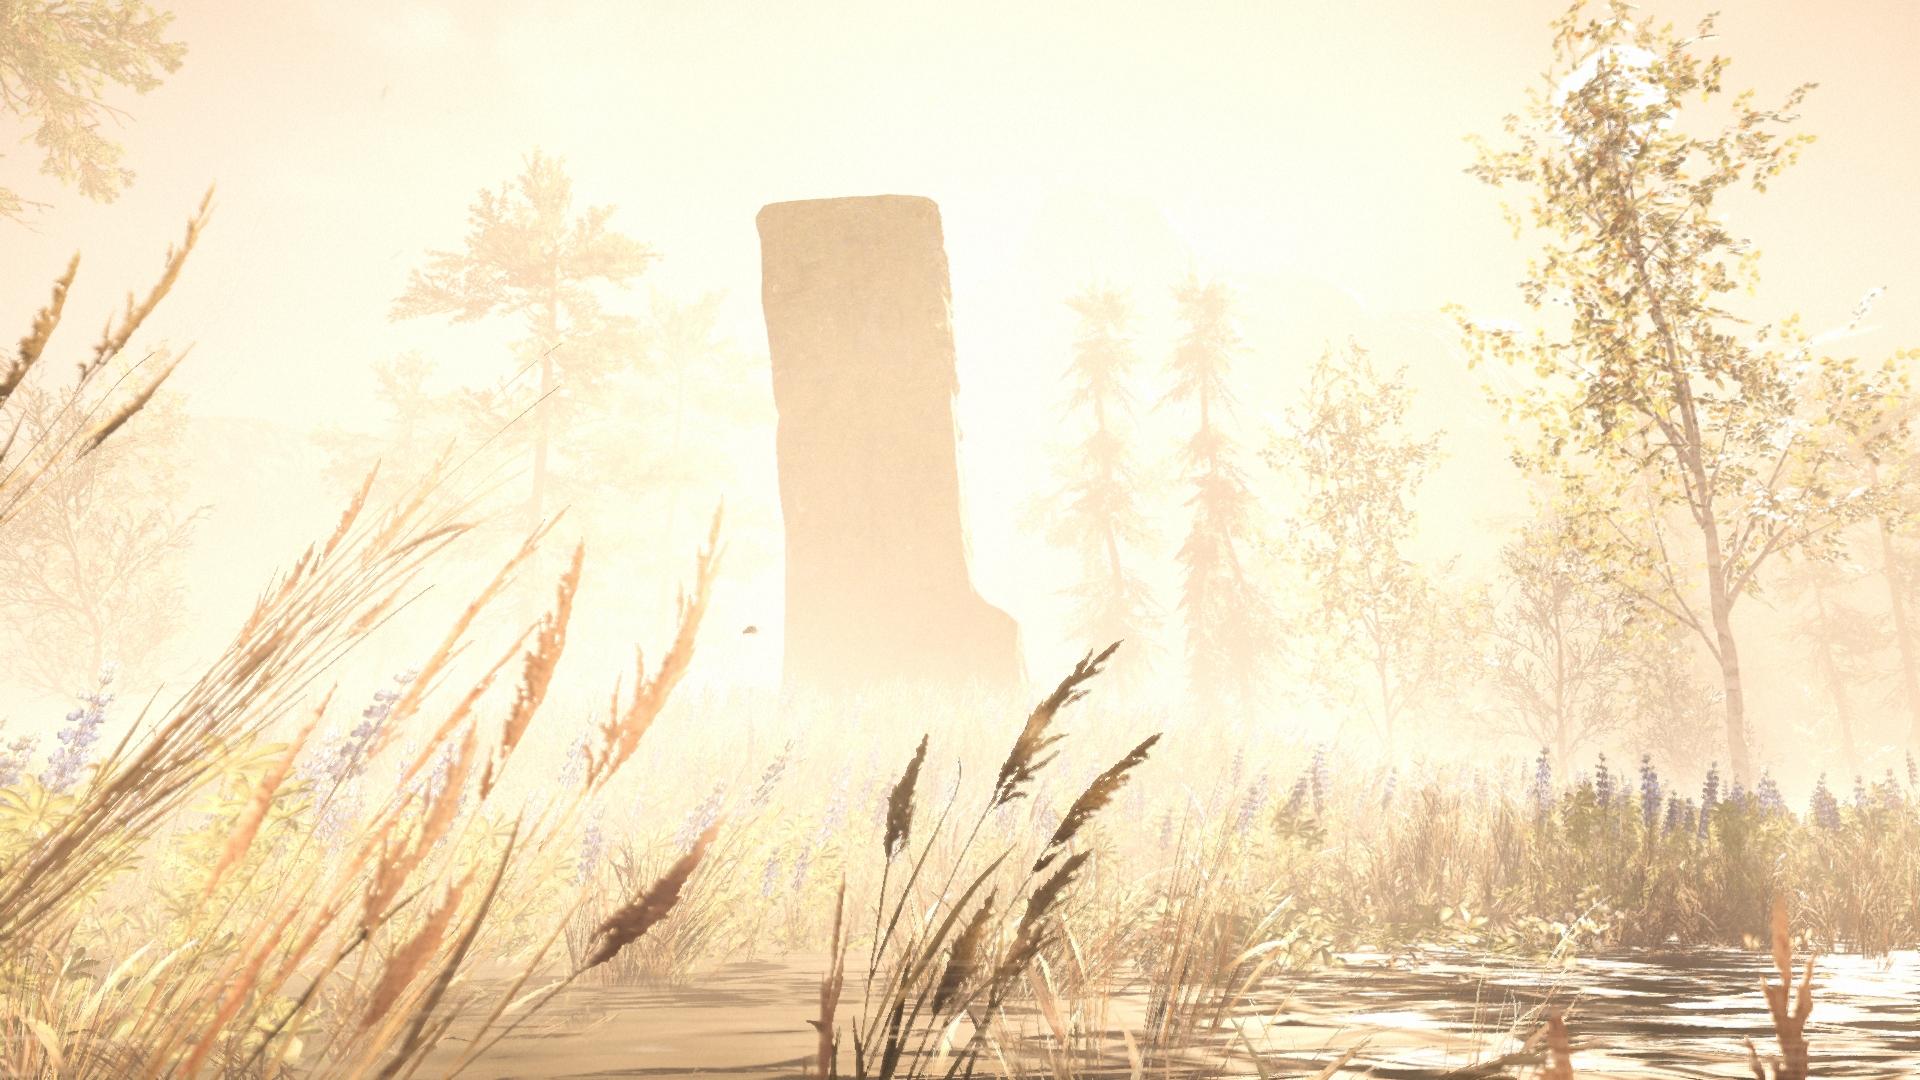 Primal monolith